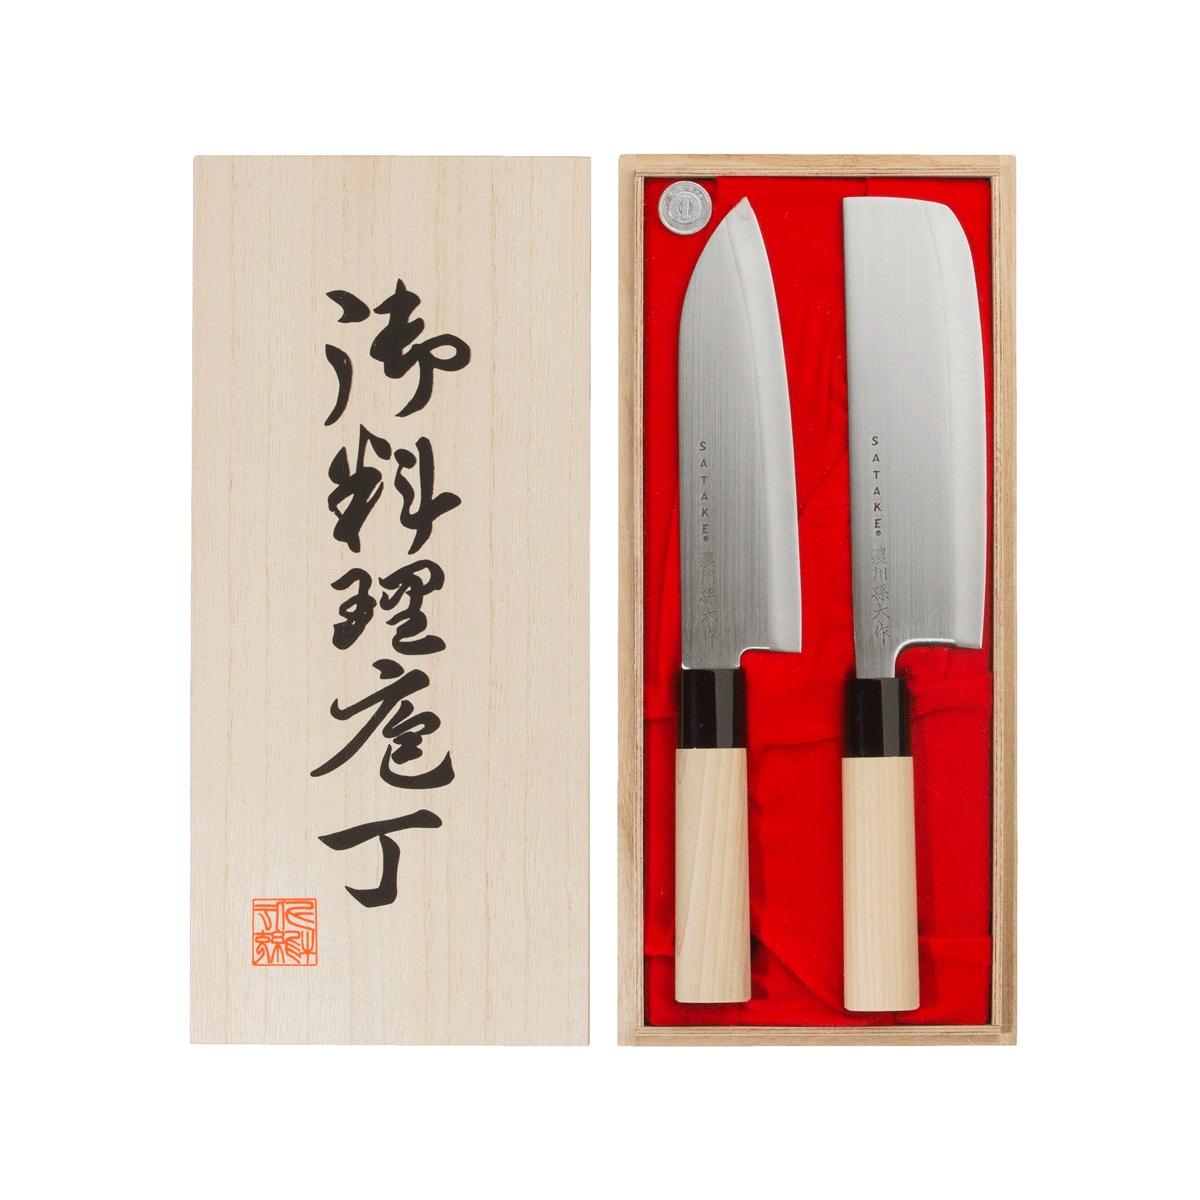 Houcho Knivset Allroundkniv + Grönsakshack, Satake